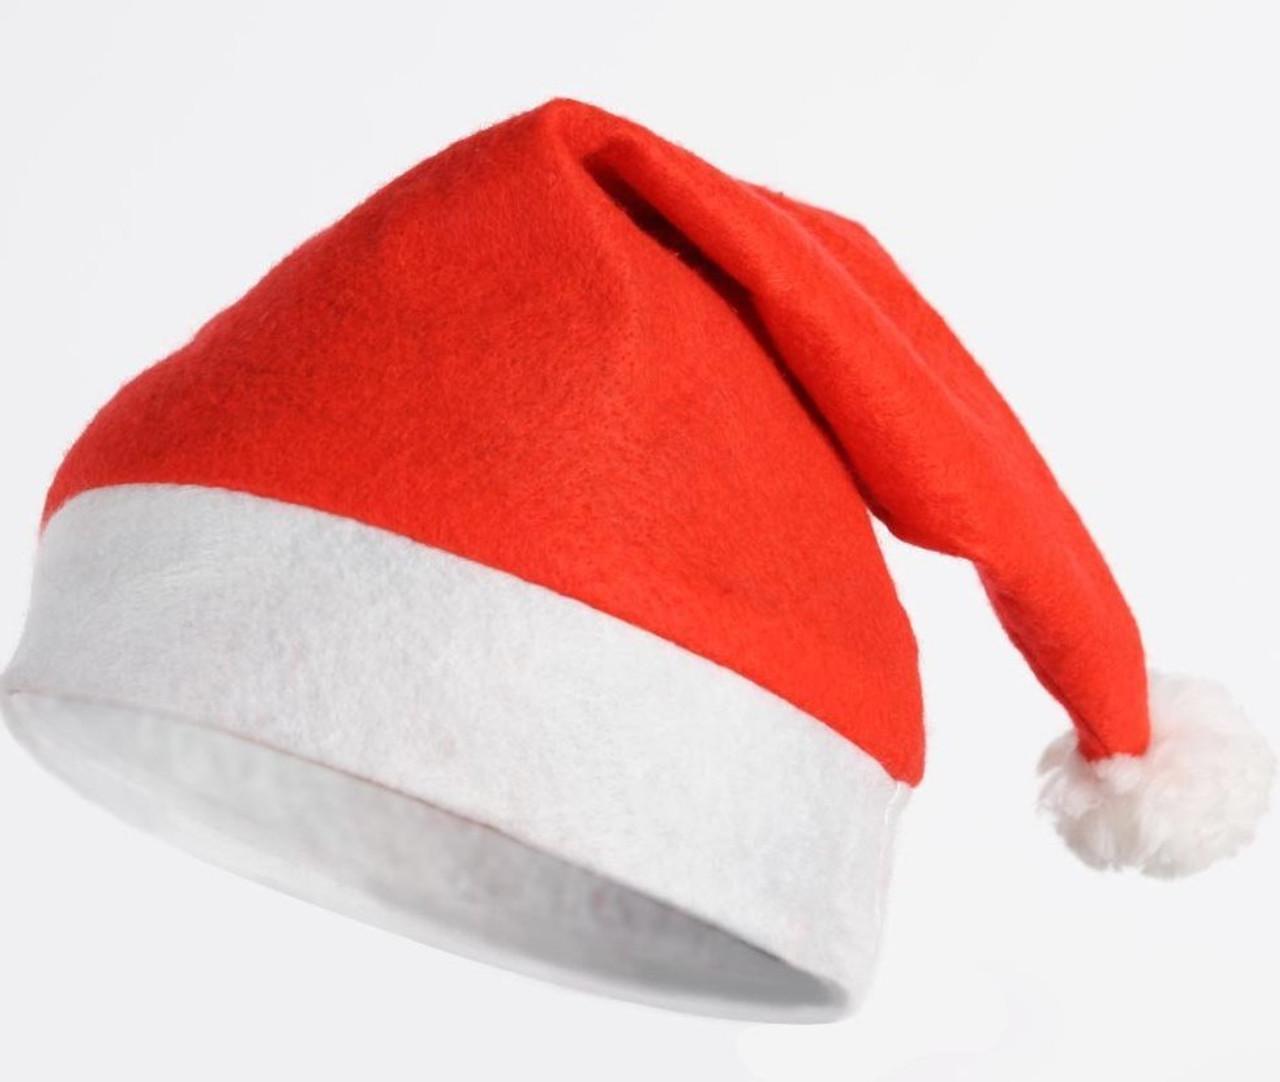 be40f72c8f552 SANTA HATS BULK 100 Budget Hats - Sydney Party Shop